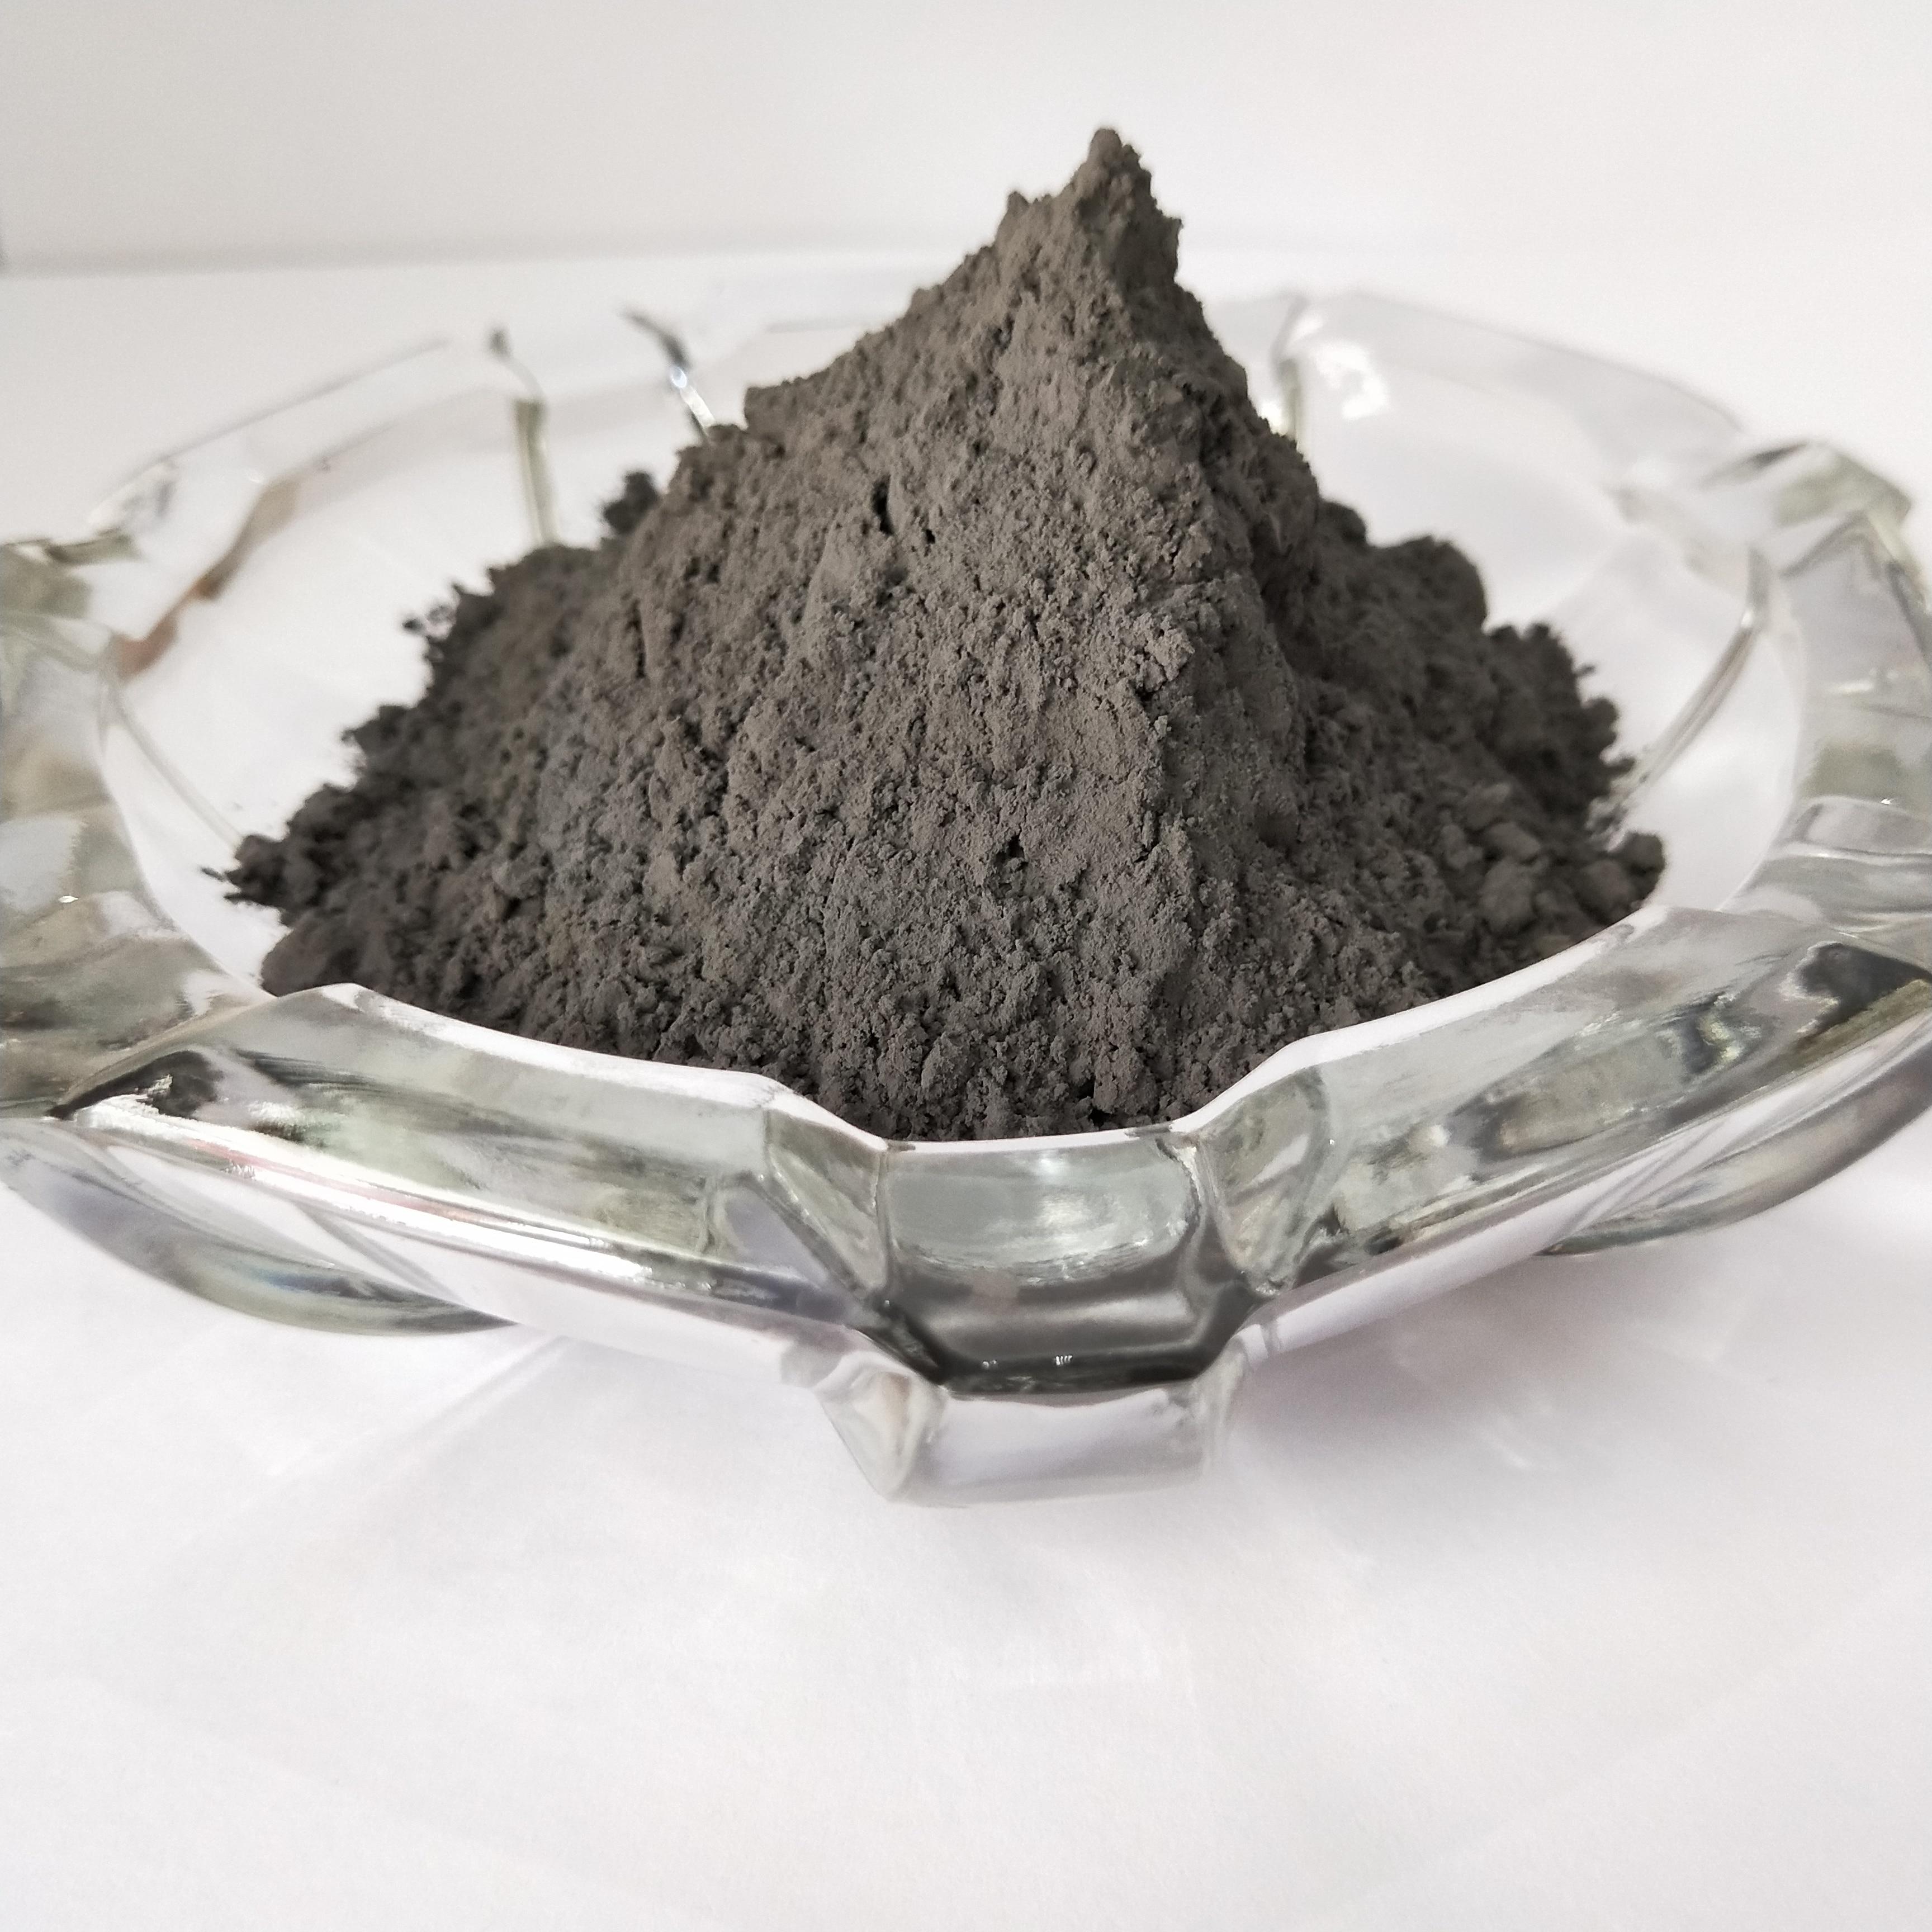 1um Tungsten Powder Nano Ultrafine Spheroidal Powders W High Purity 99.999% for Research and Development Element Metal